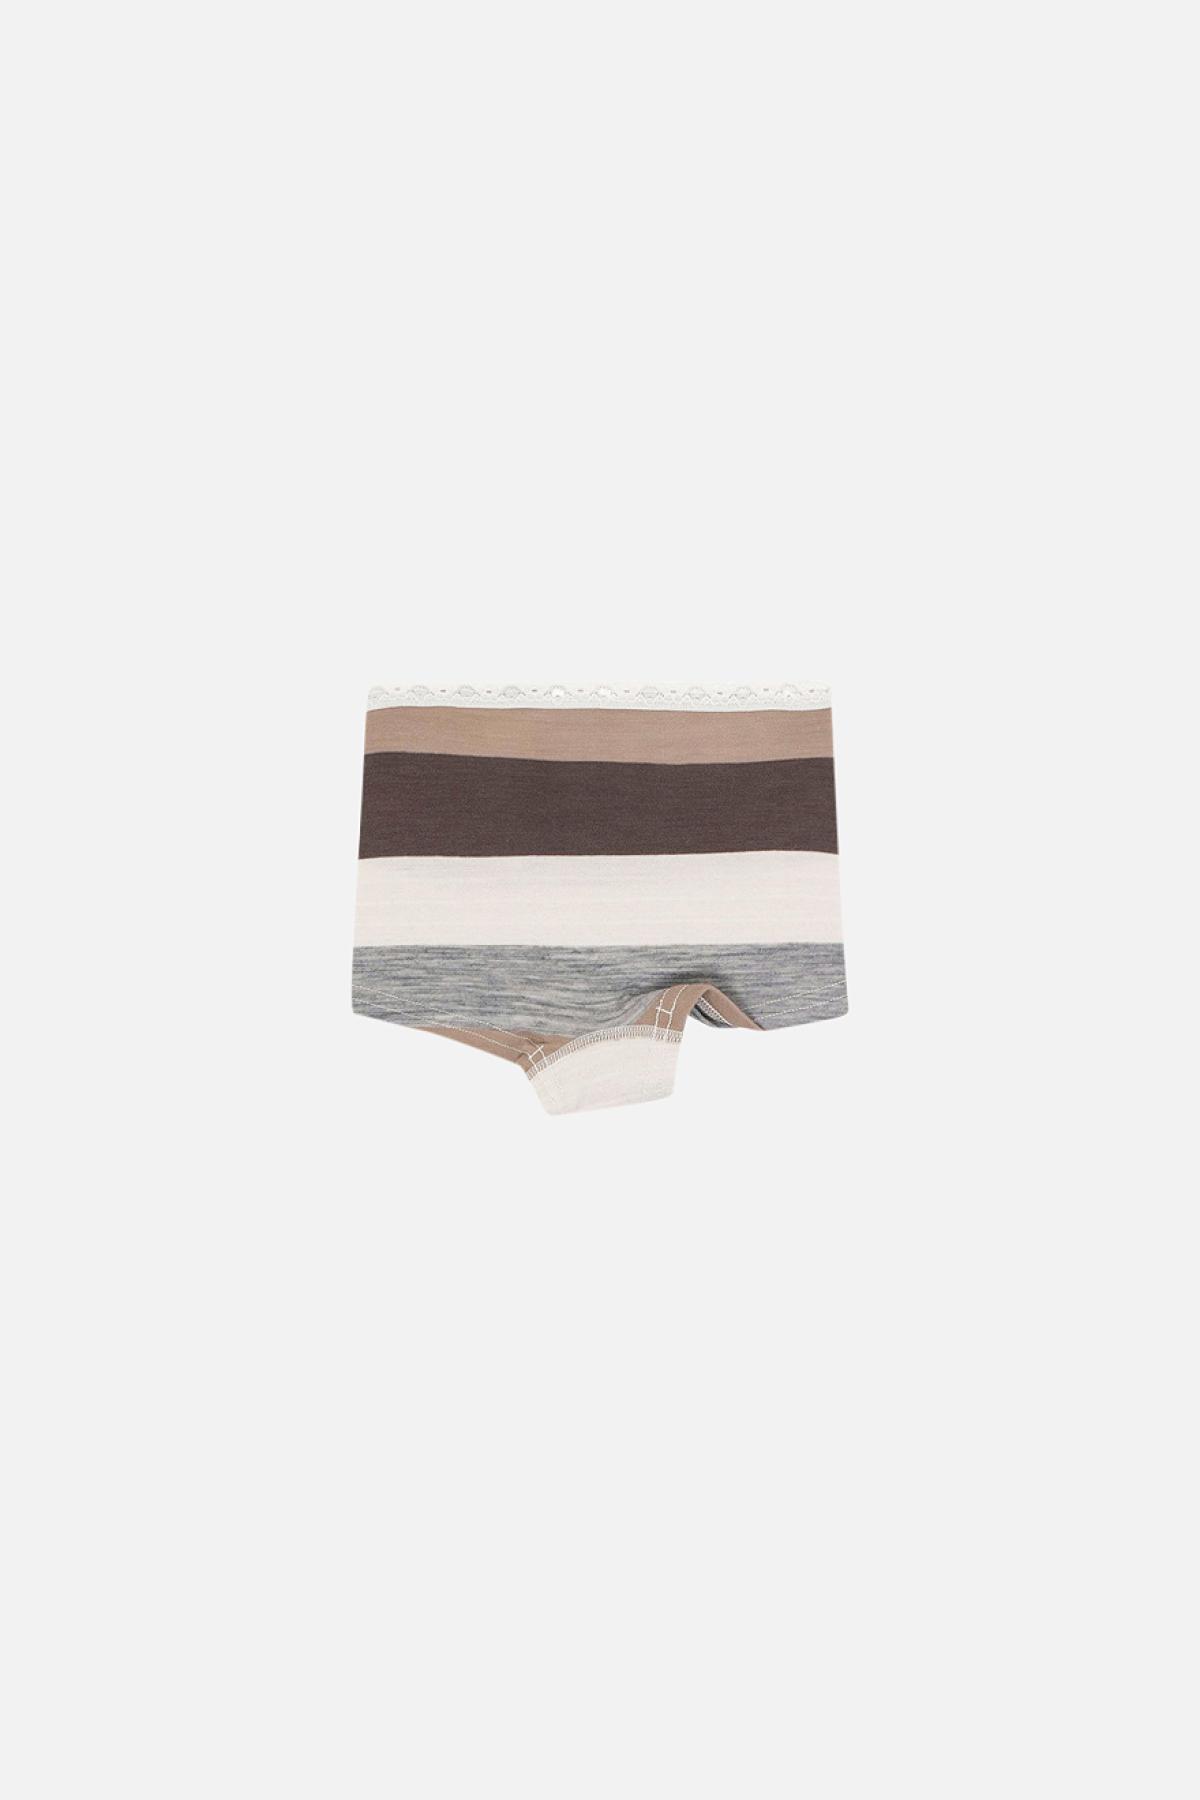 Wool/Cotton - Underpants